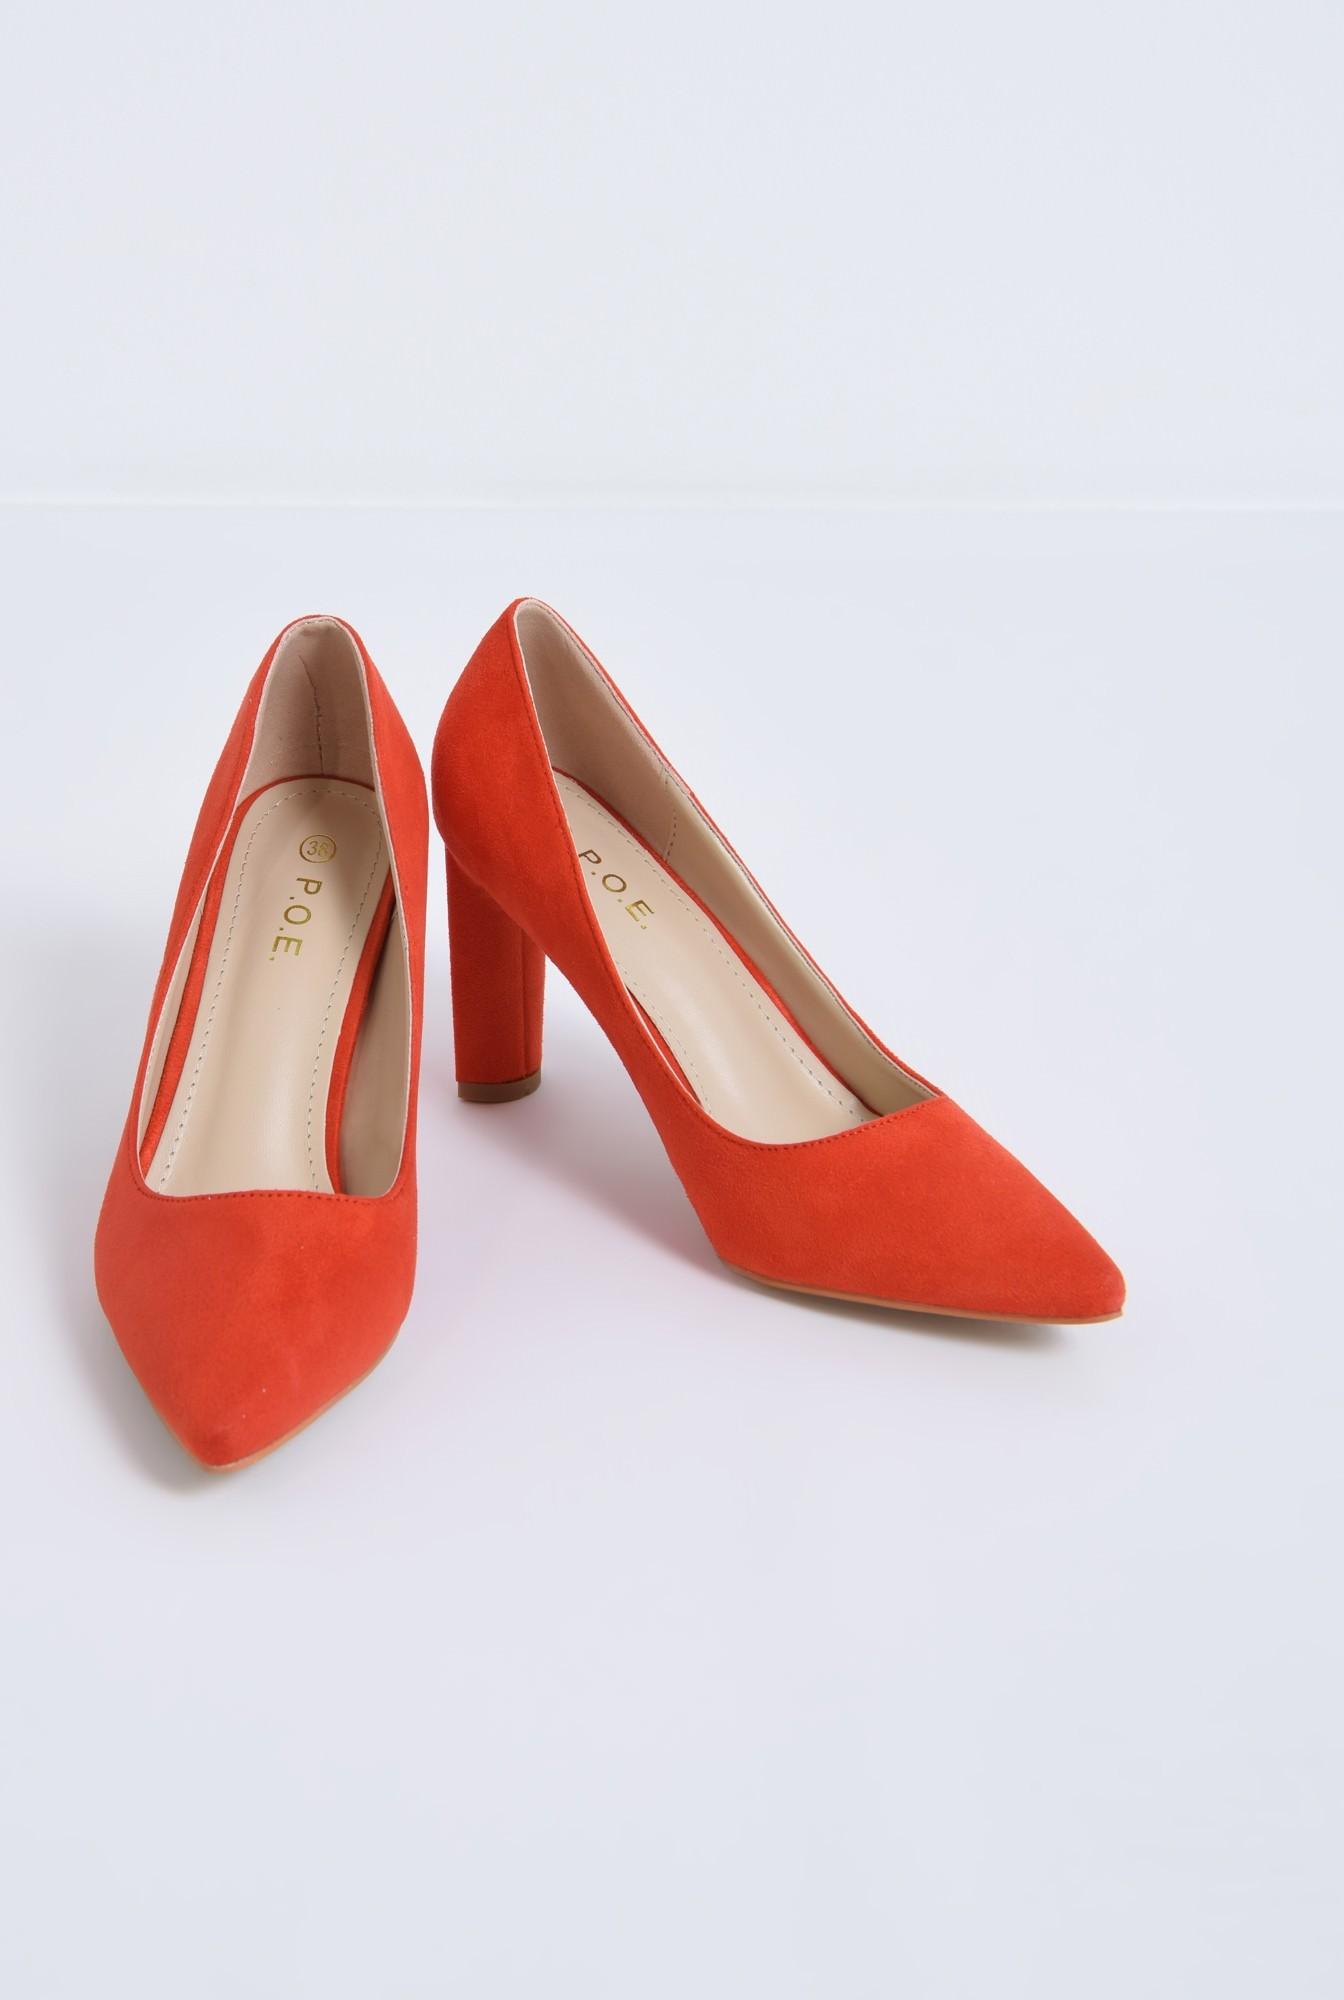 3 - pantofi casual, rosu, toc inalt